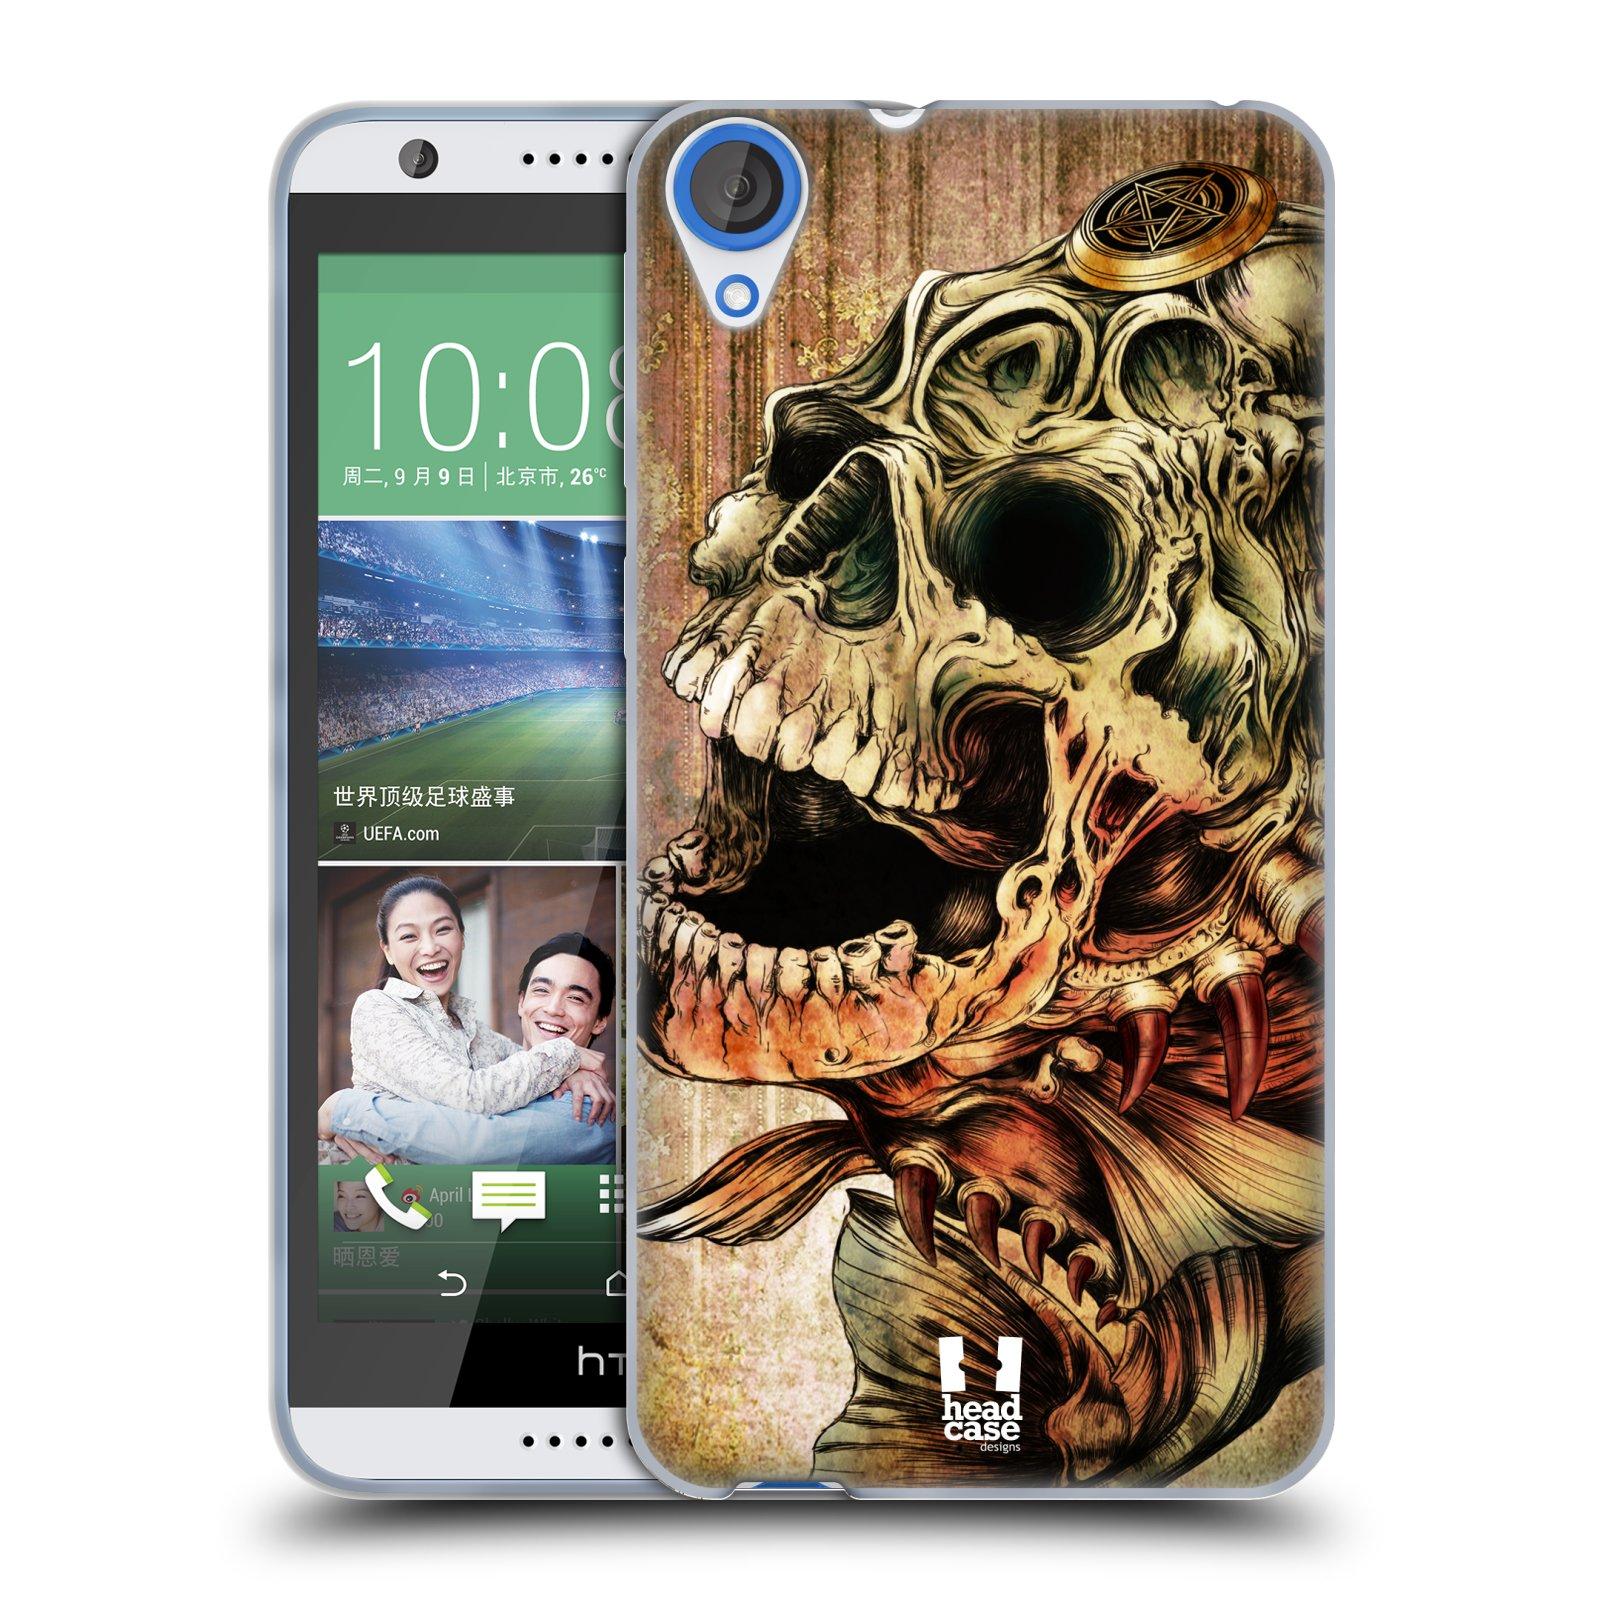 Silikonové pouzdro na mobil HTC Desire 820 HEAD CASE PIRANHA (Silikonový kryt či obal na mobilní telefon HTC Desire 820)